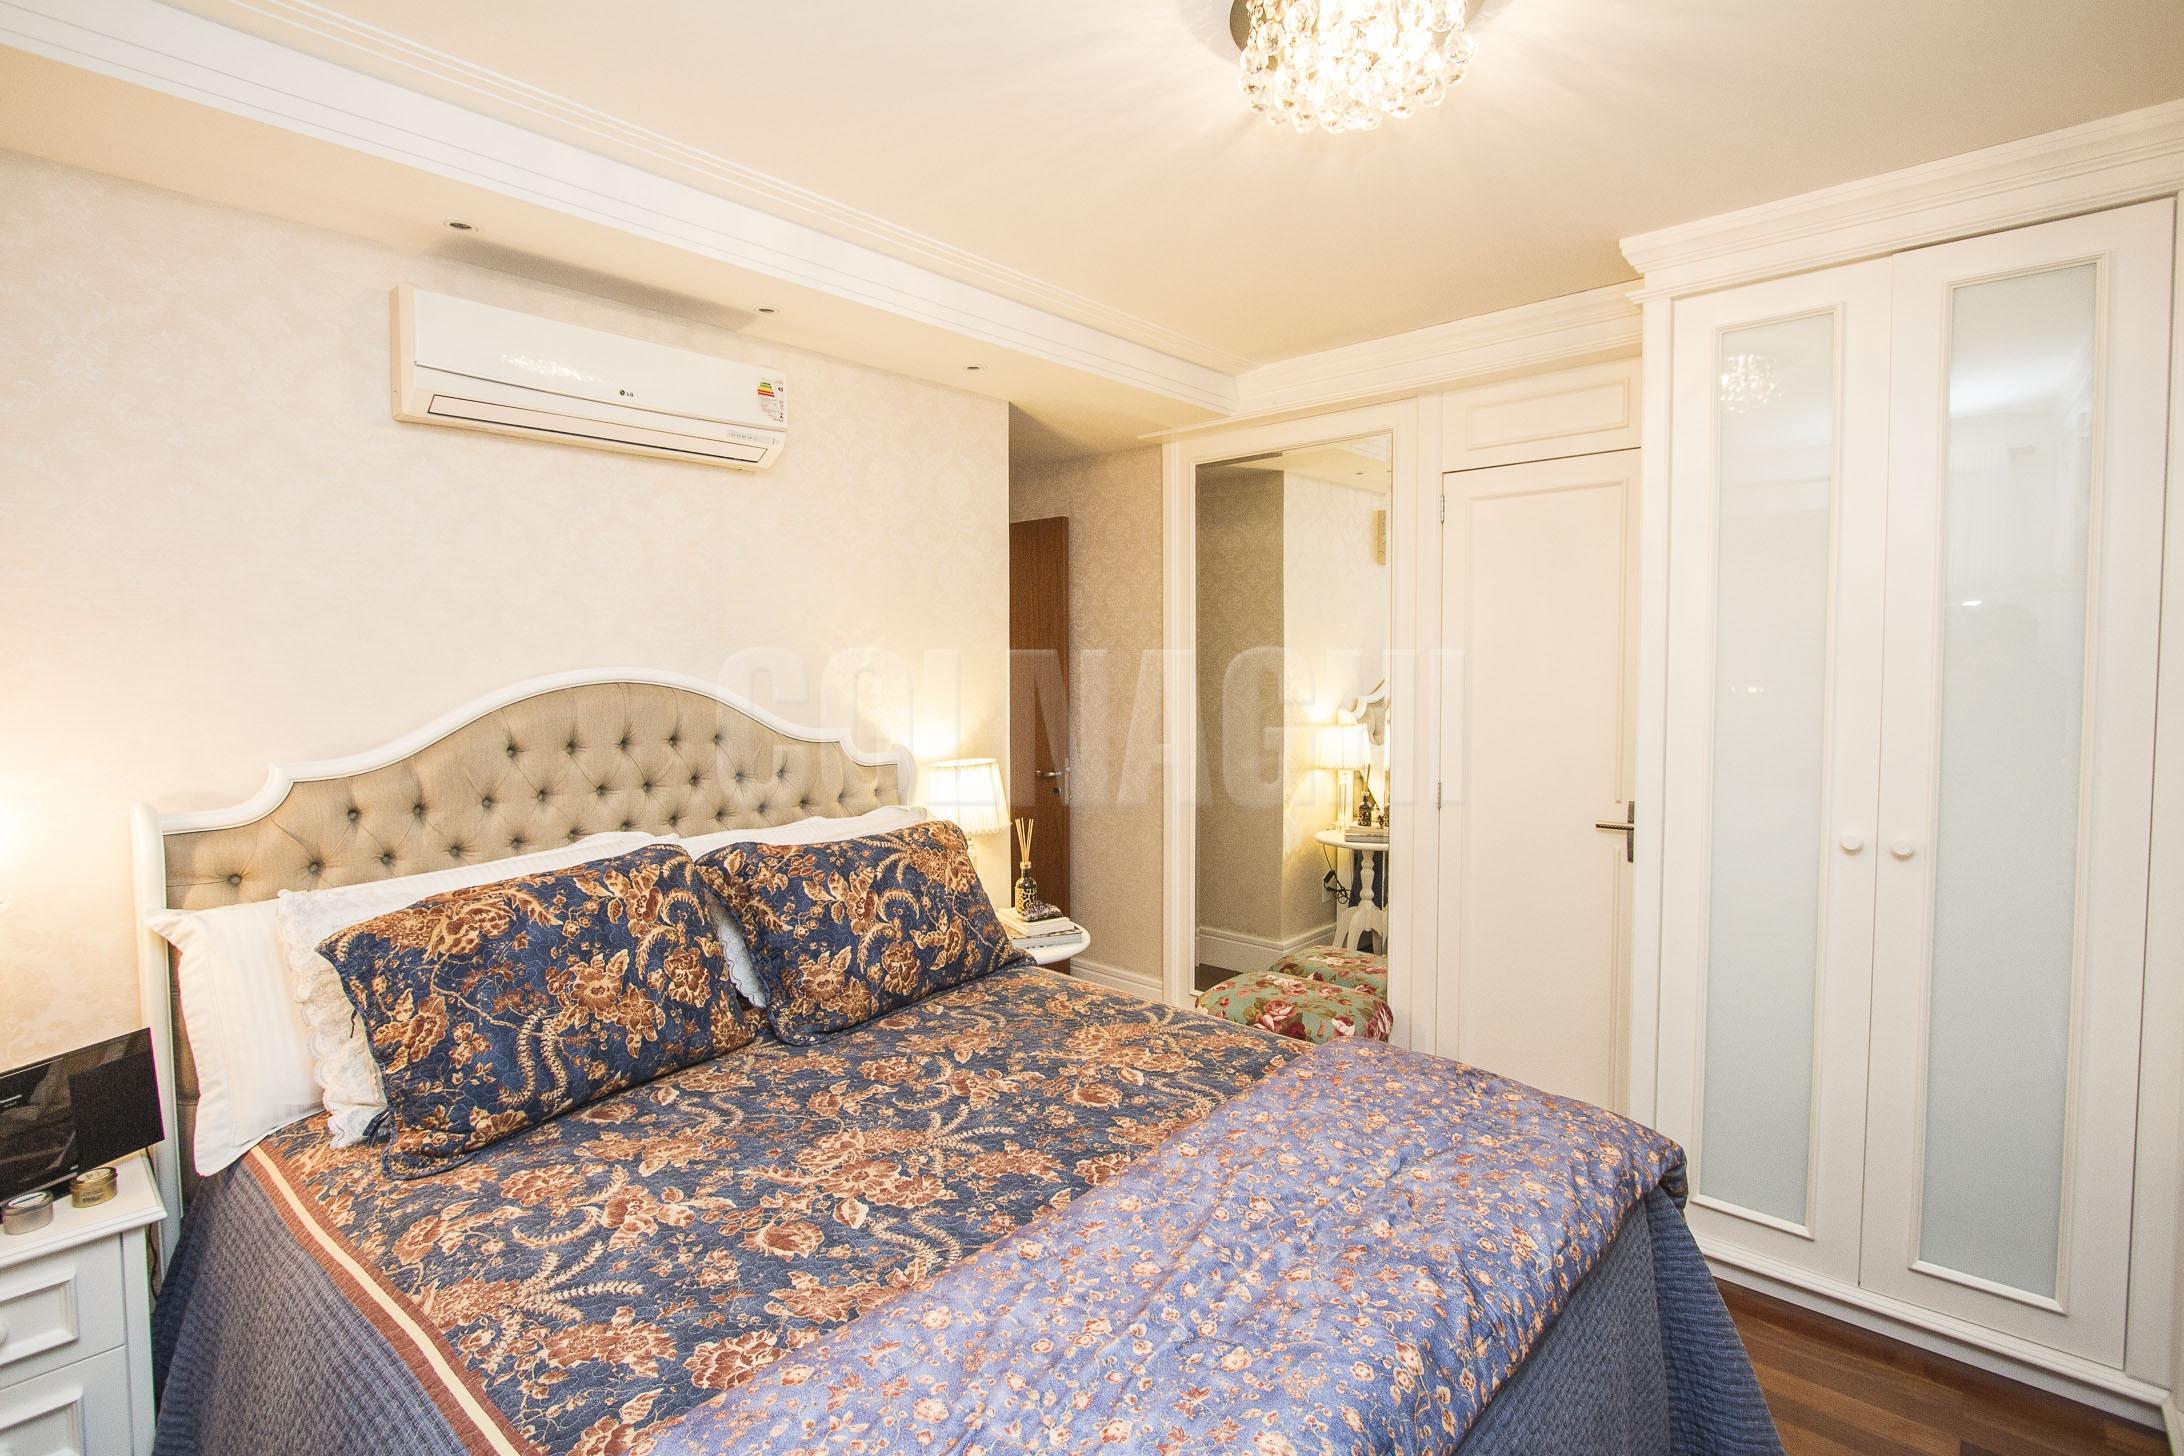 Clos Lucé - Apto 2 Dorm, Rio Branco, Porto Alegre (CL13242) - Foto 15